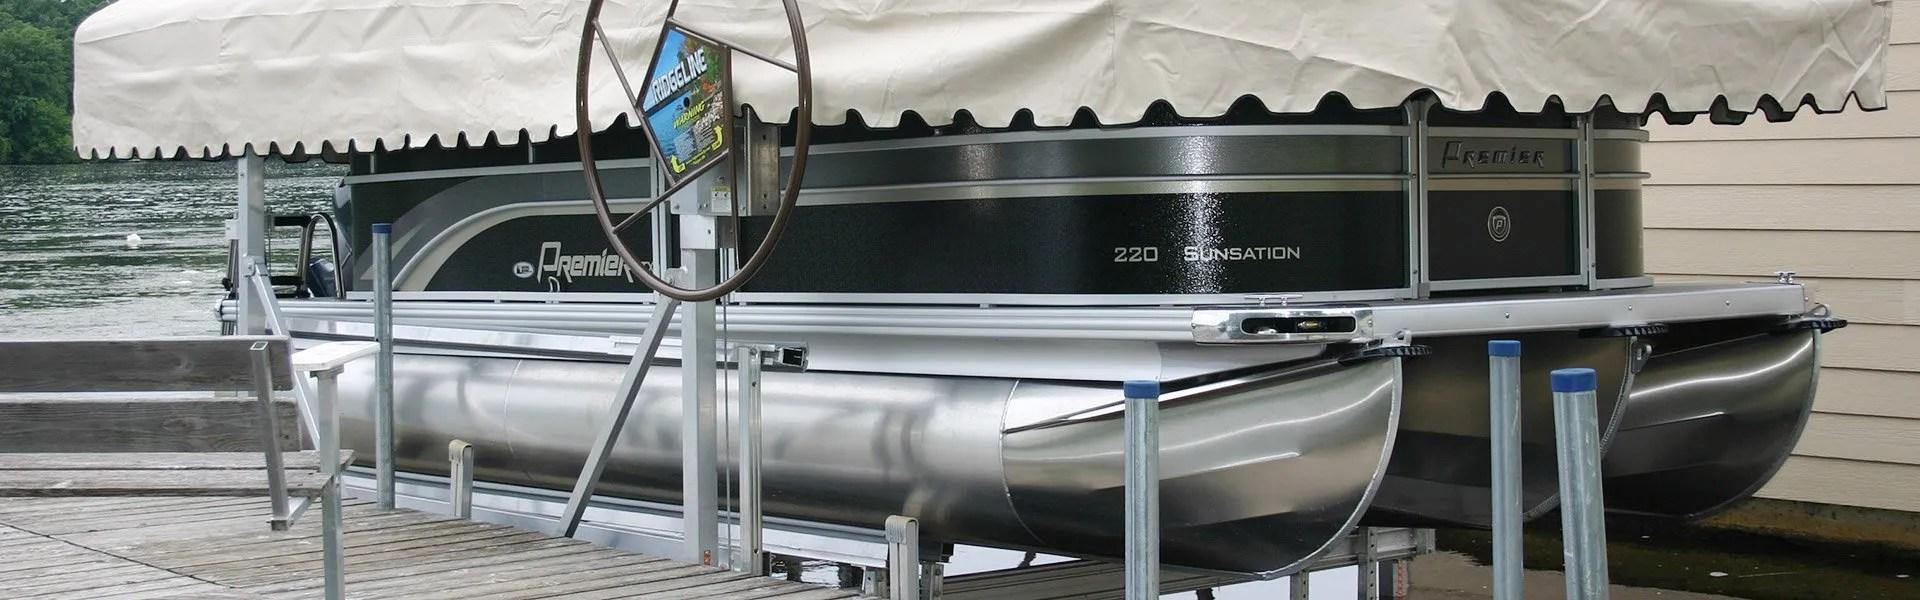 RIDGELINE Vertical Boat Lifts & Boat Lifts and Canopies u2013 Ridgeline Manufacturing u2013 creating high ...